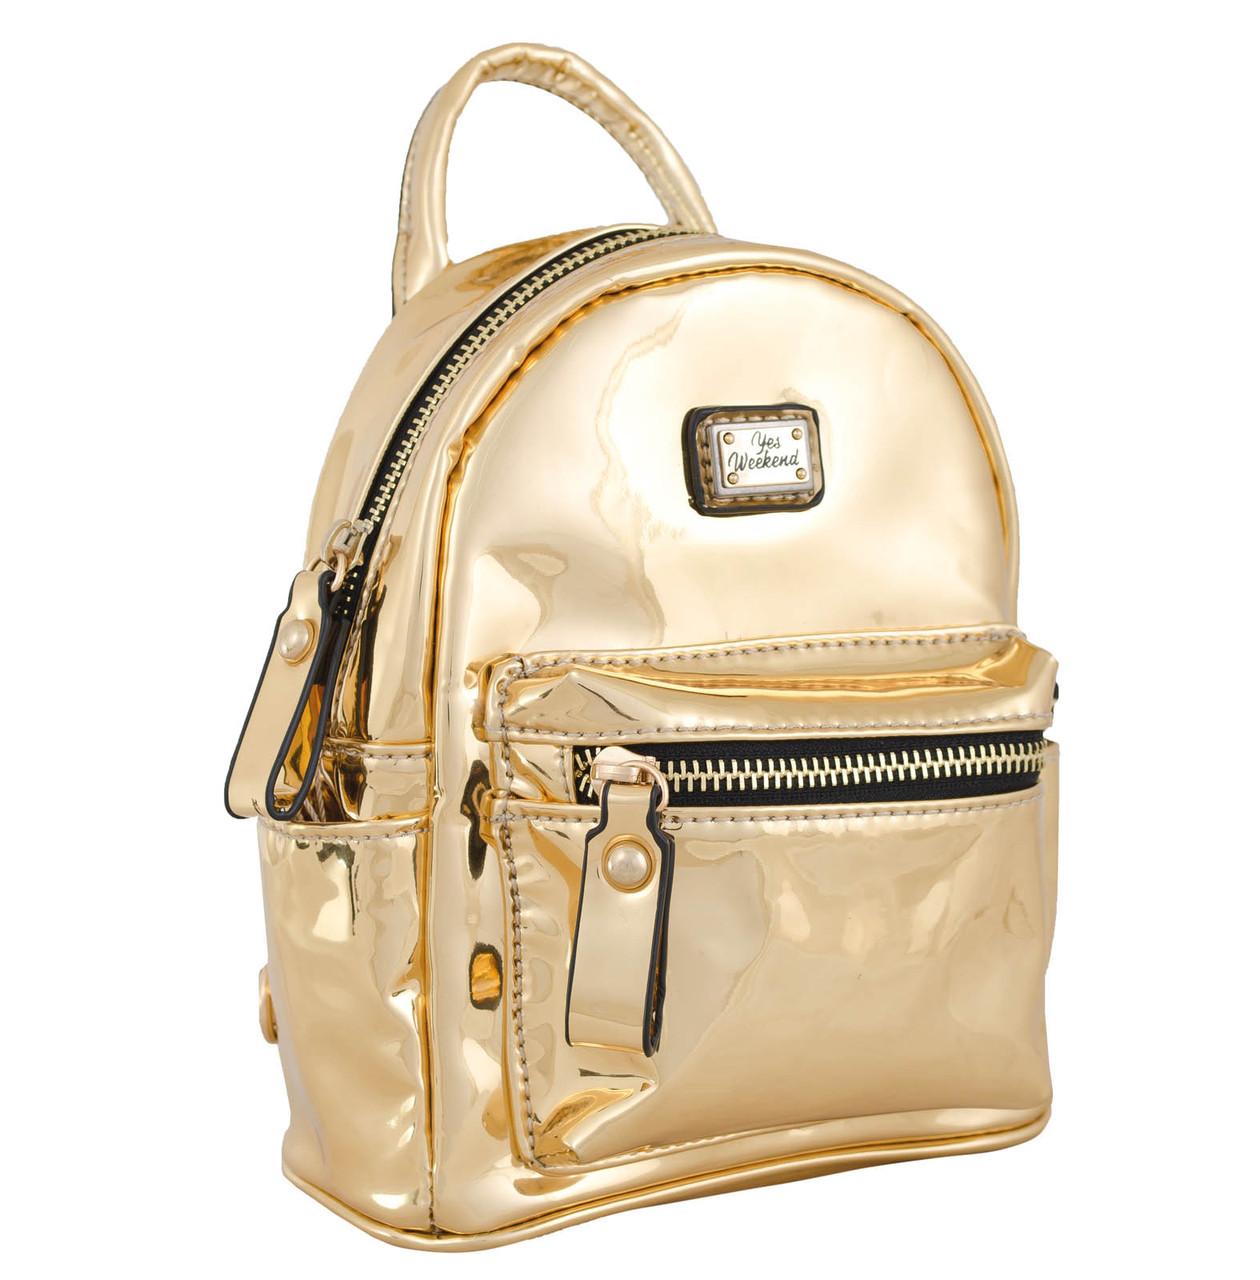 9fc420f8bc93 Женская сумка-рюкзак из экокожи 1 ВЕРЕСНЯ, Mirorr gold 3 л - SUPERSUMKA  интернет